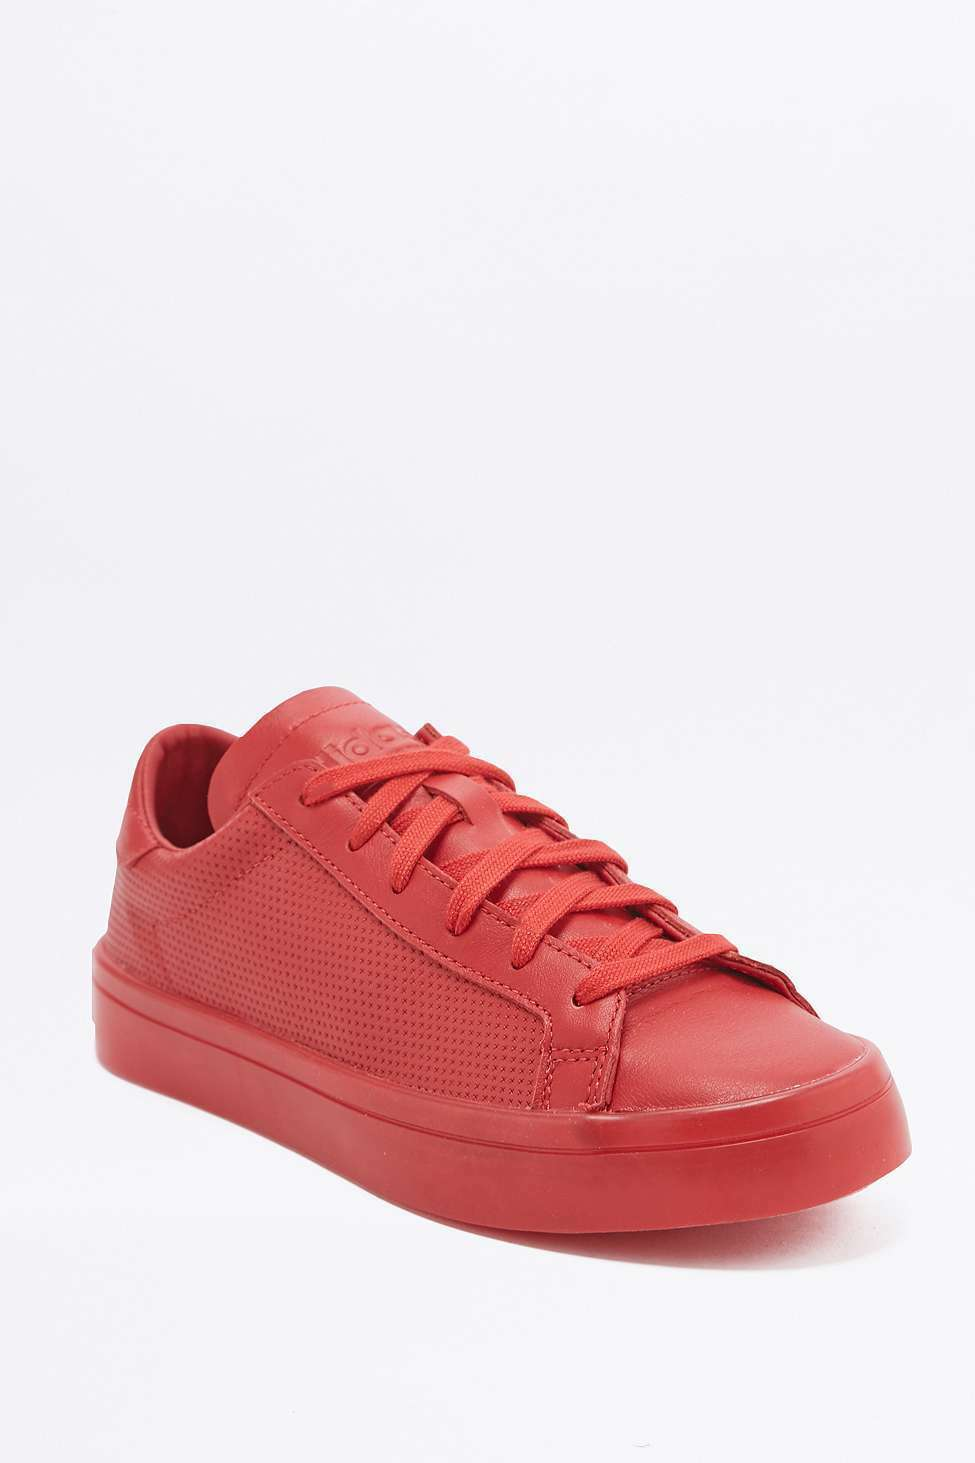 adidas Originals CourtVantage Adicolor Trainers S80253 - ROT - UK 4   NEU